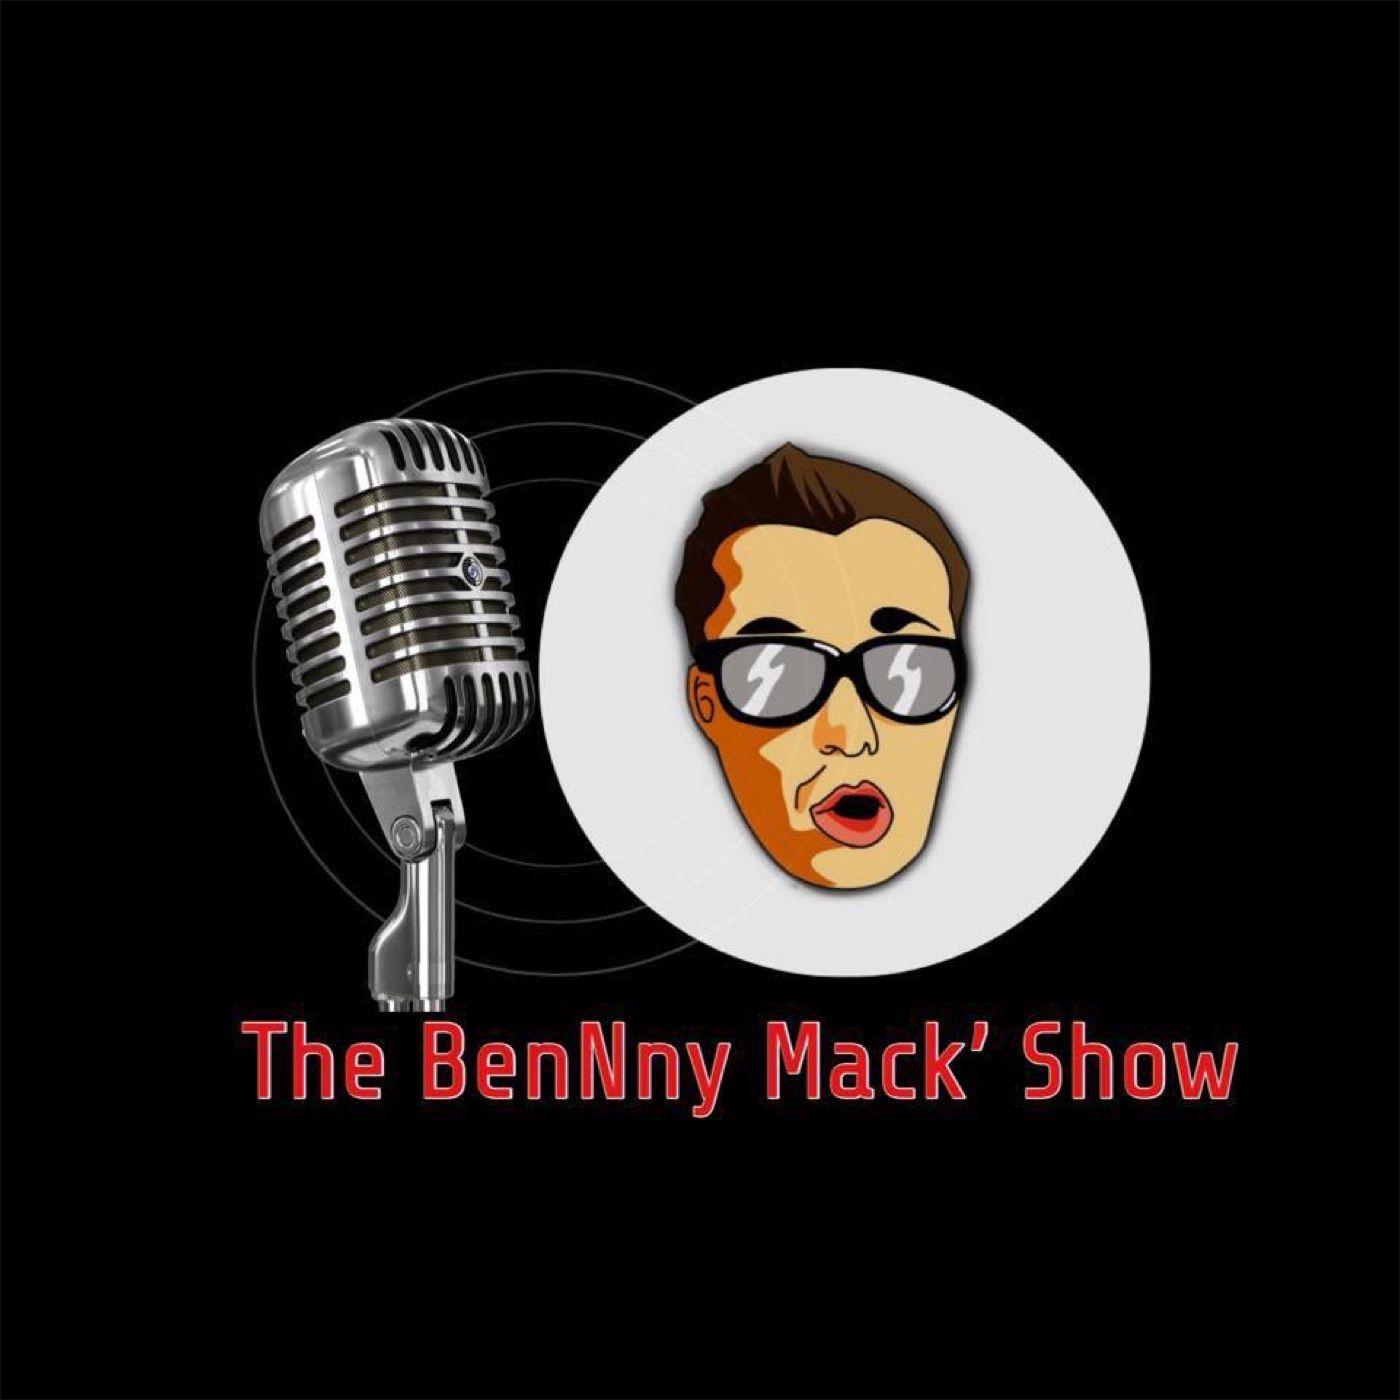 The BenNny Mack' Show